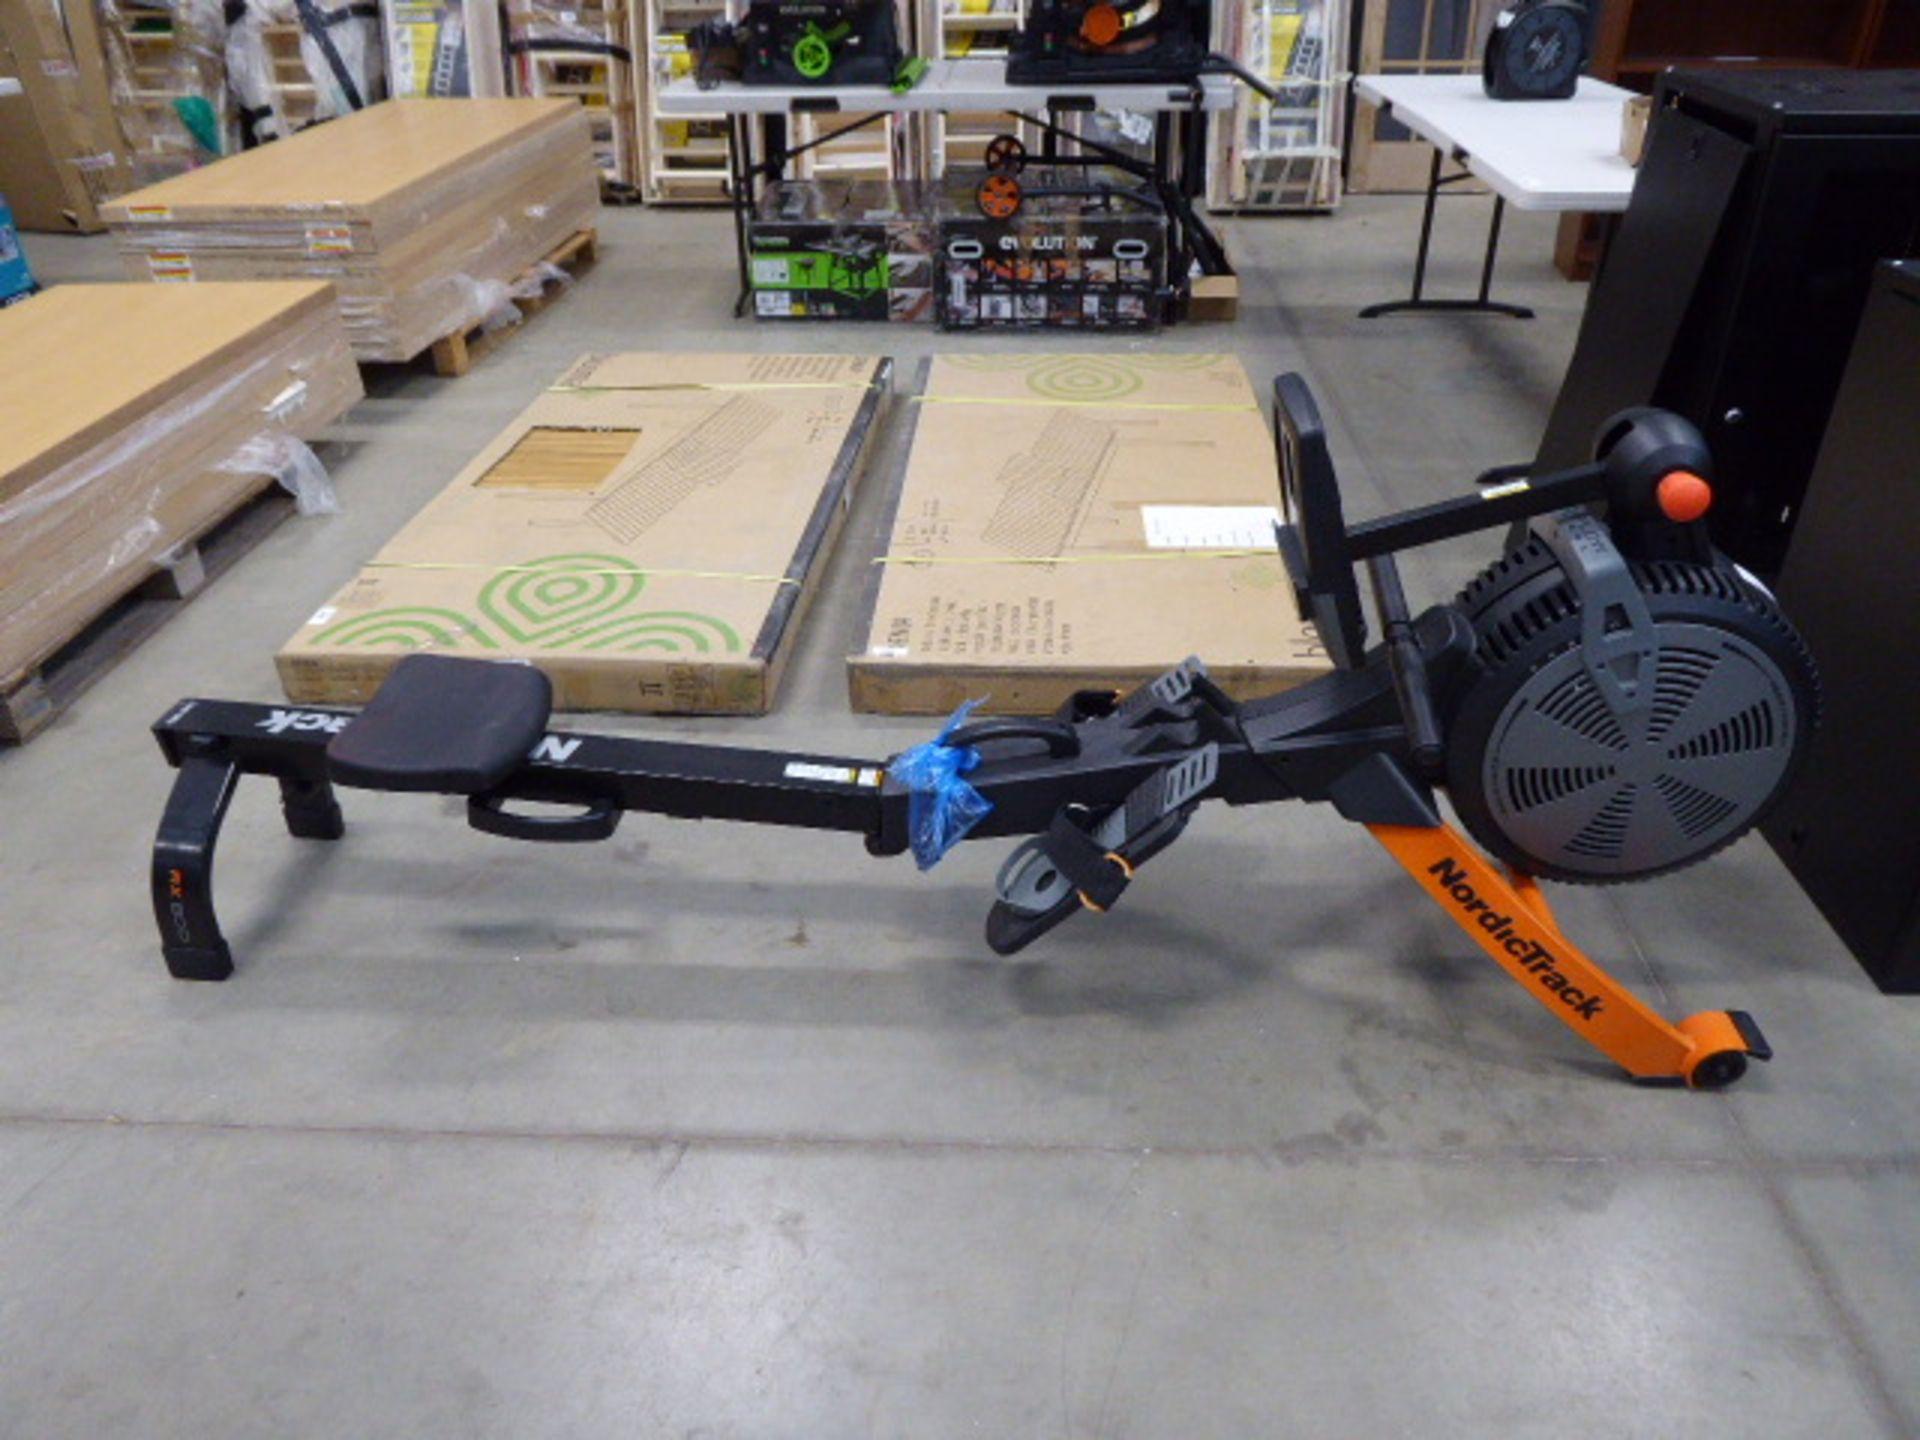 Nordic Track Airflow rowing machine